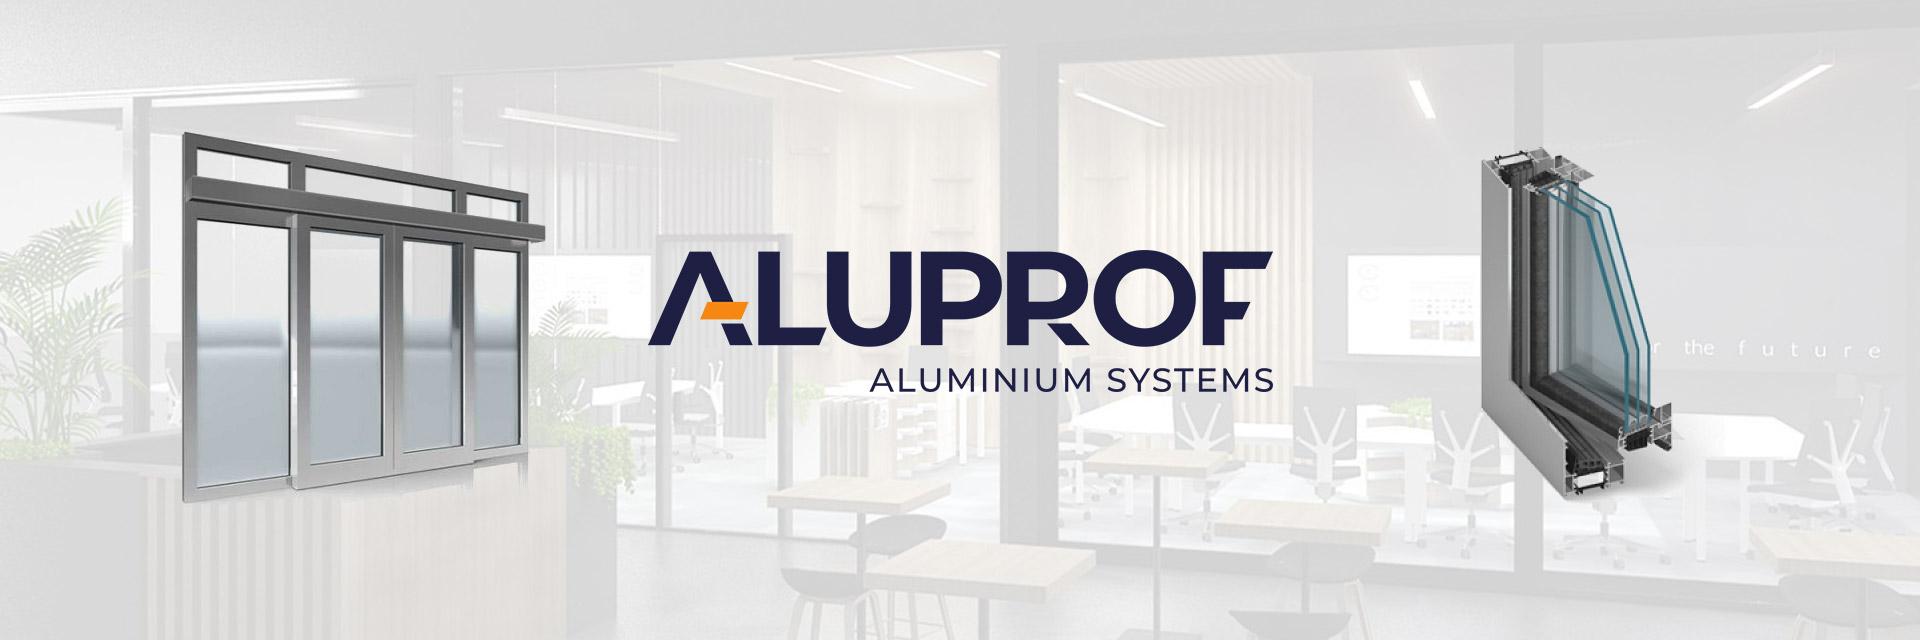 aluprof_slide_alfe